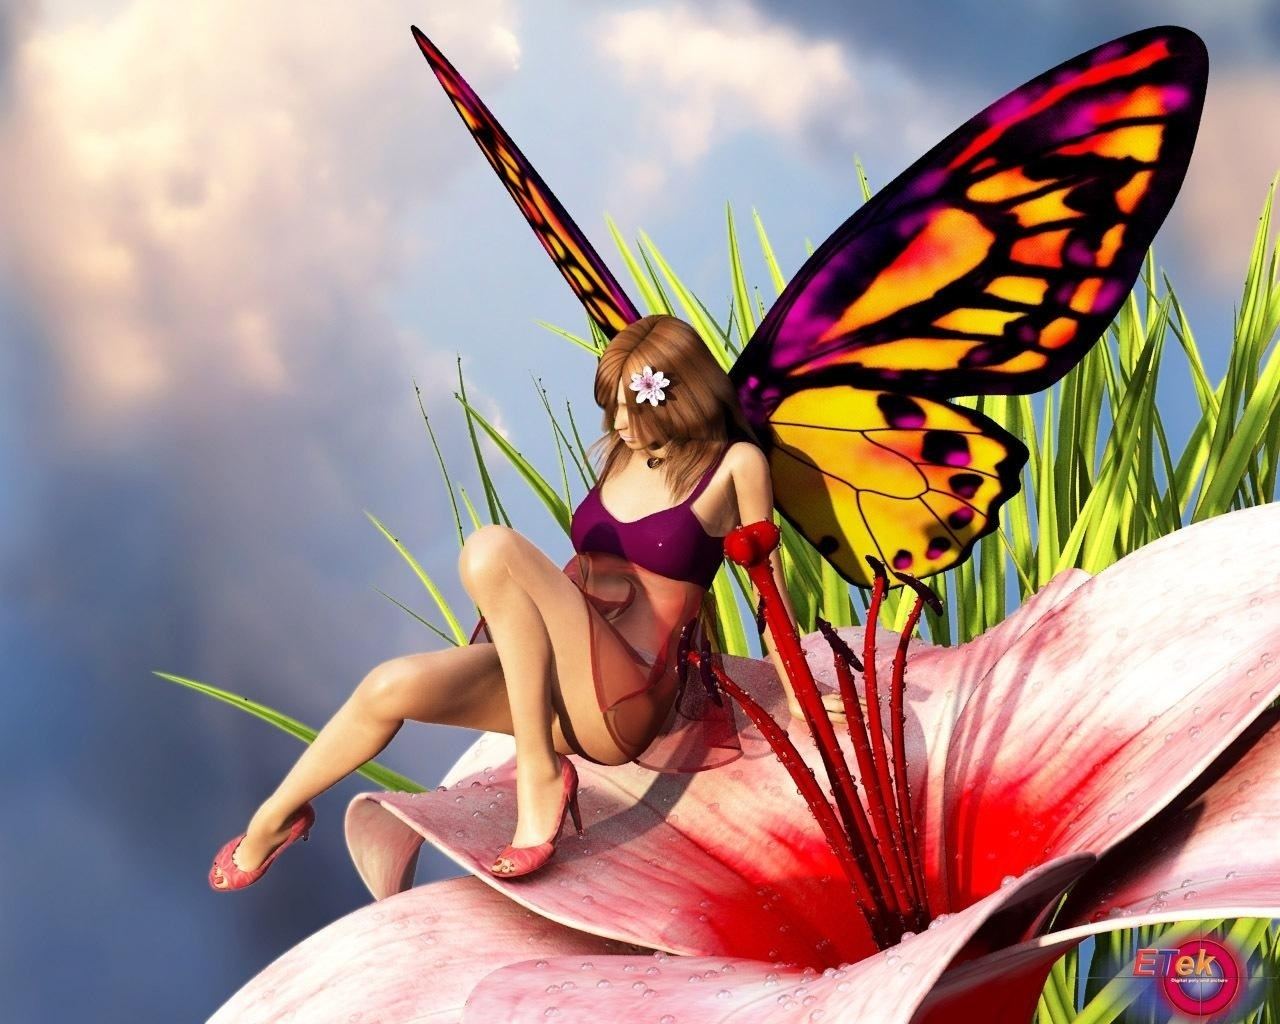 little girl butterfly wallpapers - photo #18